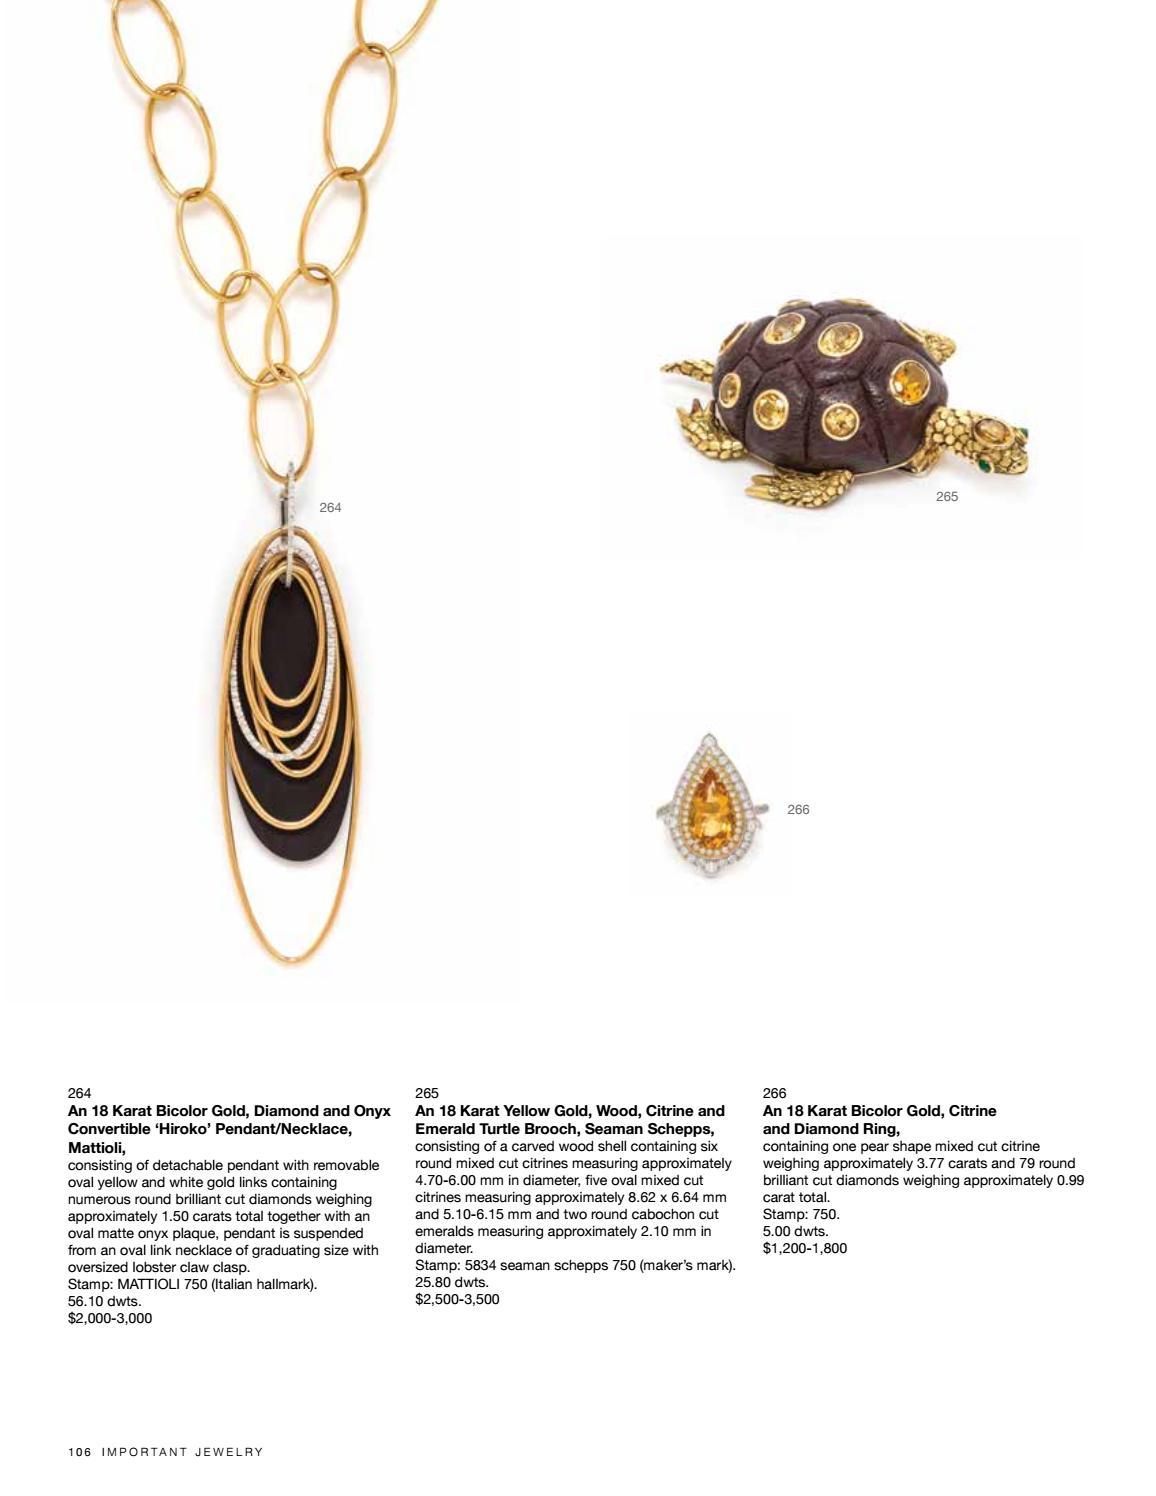 Sale 592 | Important Jewelry